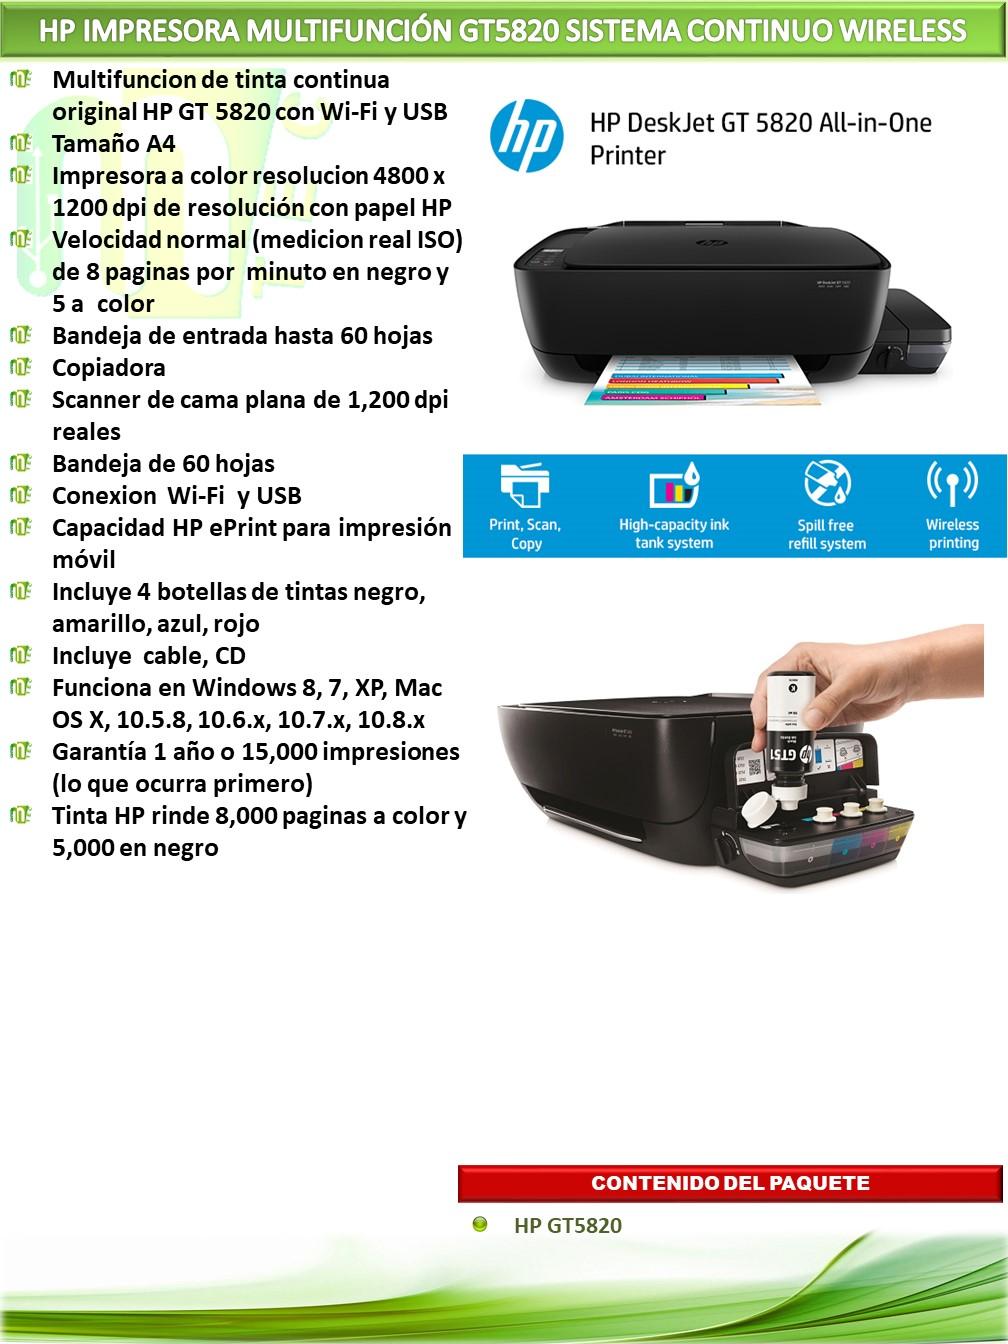 Hp Impresora Multifunci 211 N Gt5820 Sistema Continuo Wireless